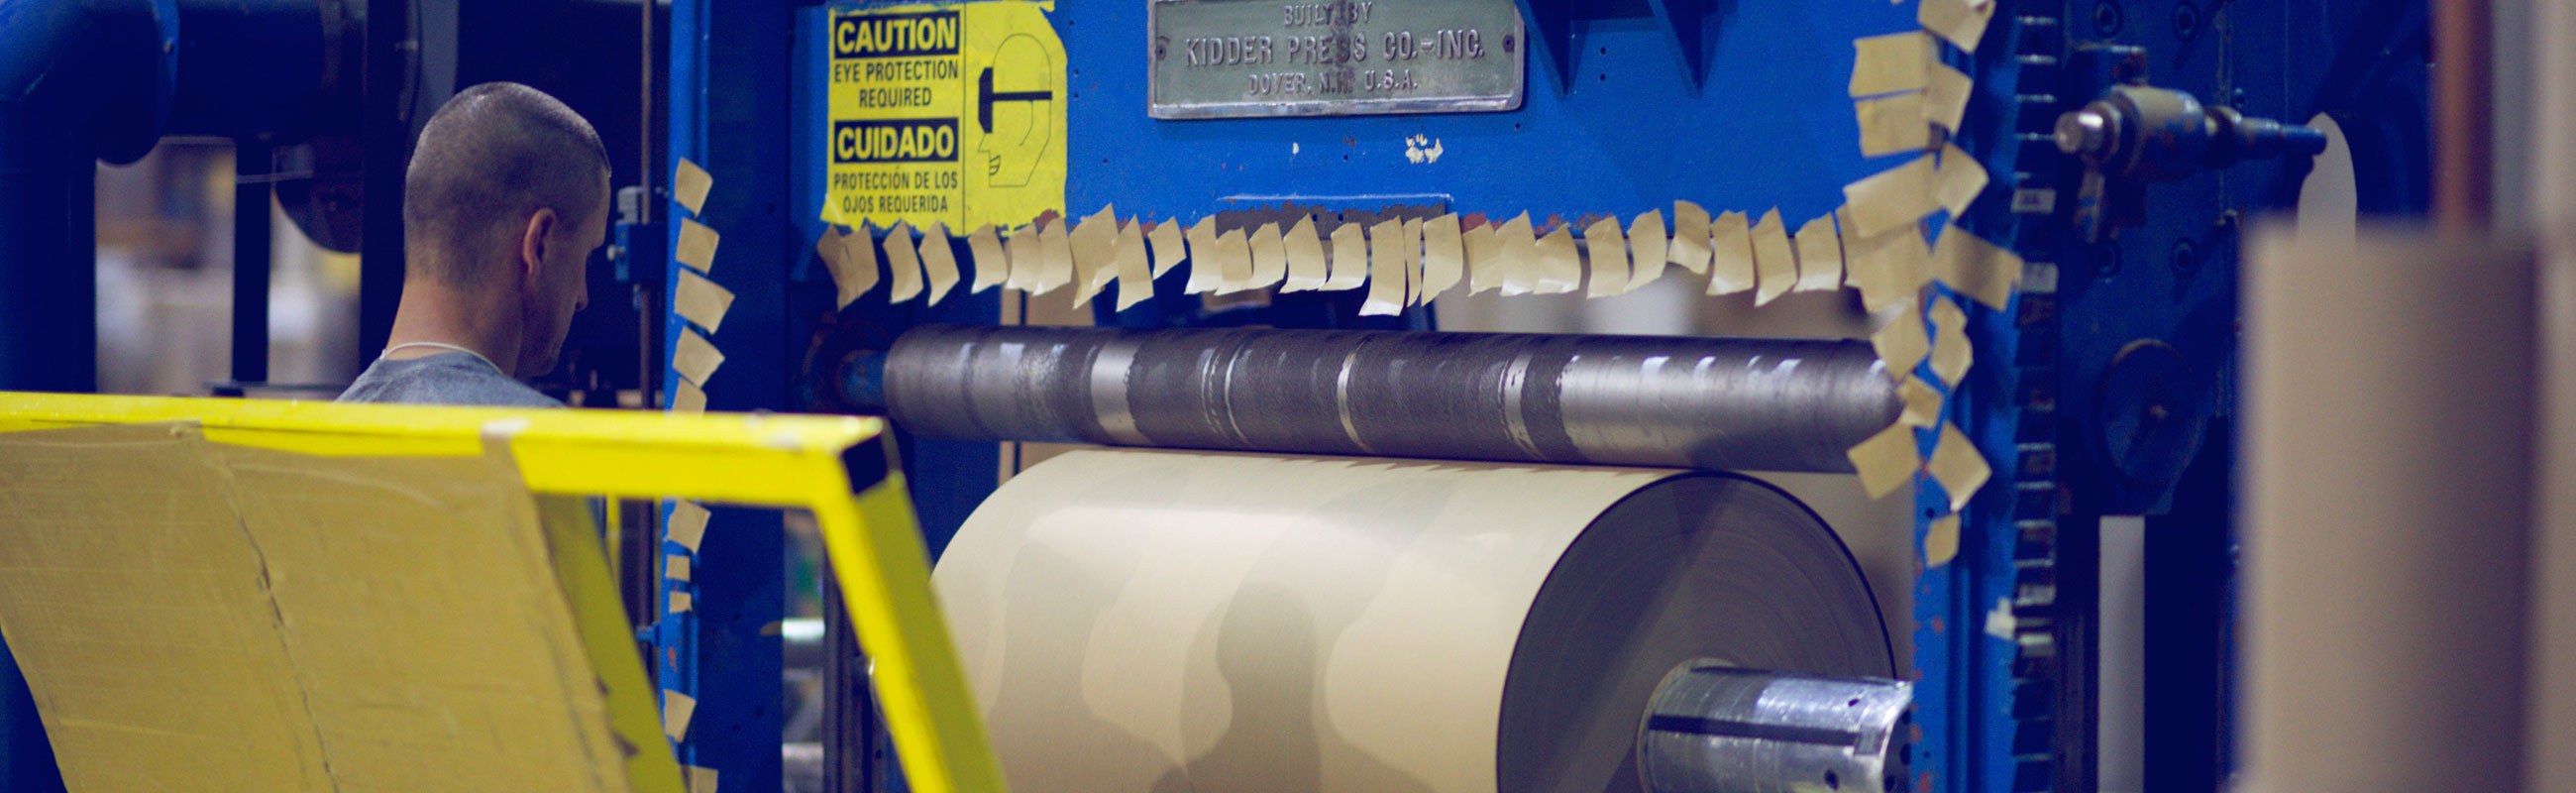 Dunnage paper rolls rewinding